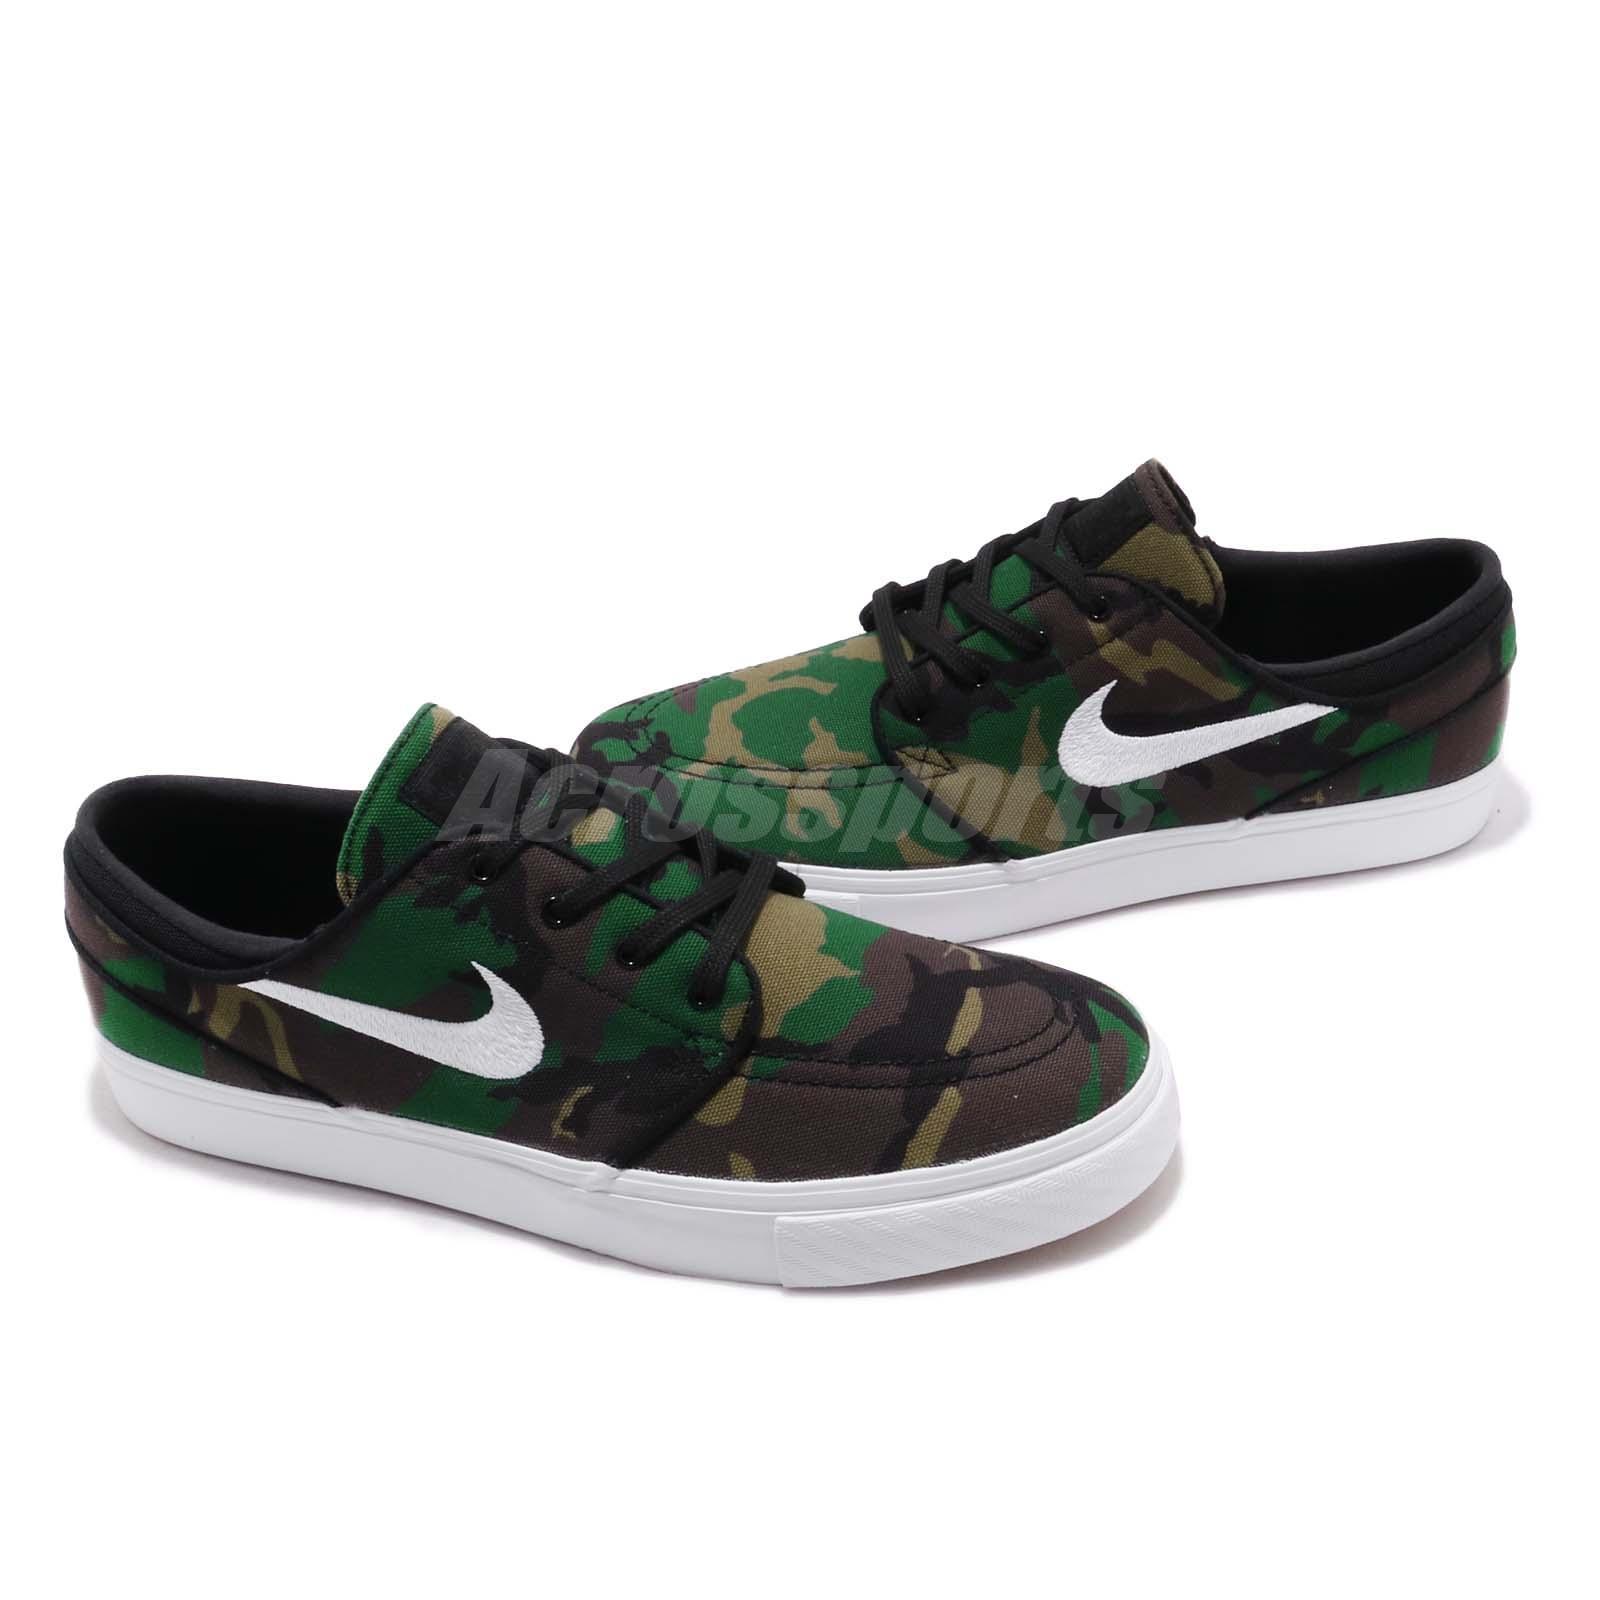 size 40 84f37 2b964 Nike SB Zoom Stefan Janoski CNVS Canvas Camo Mens Skateboard